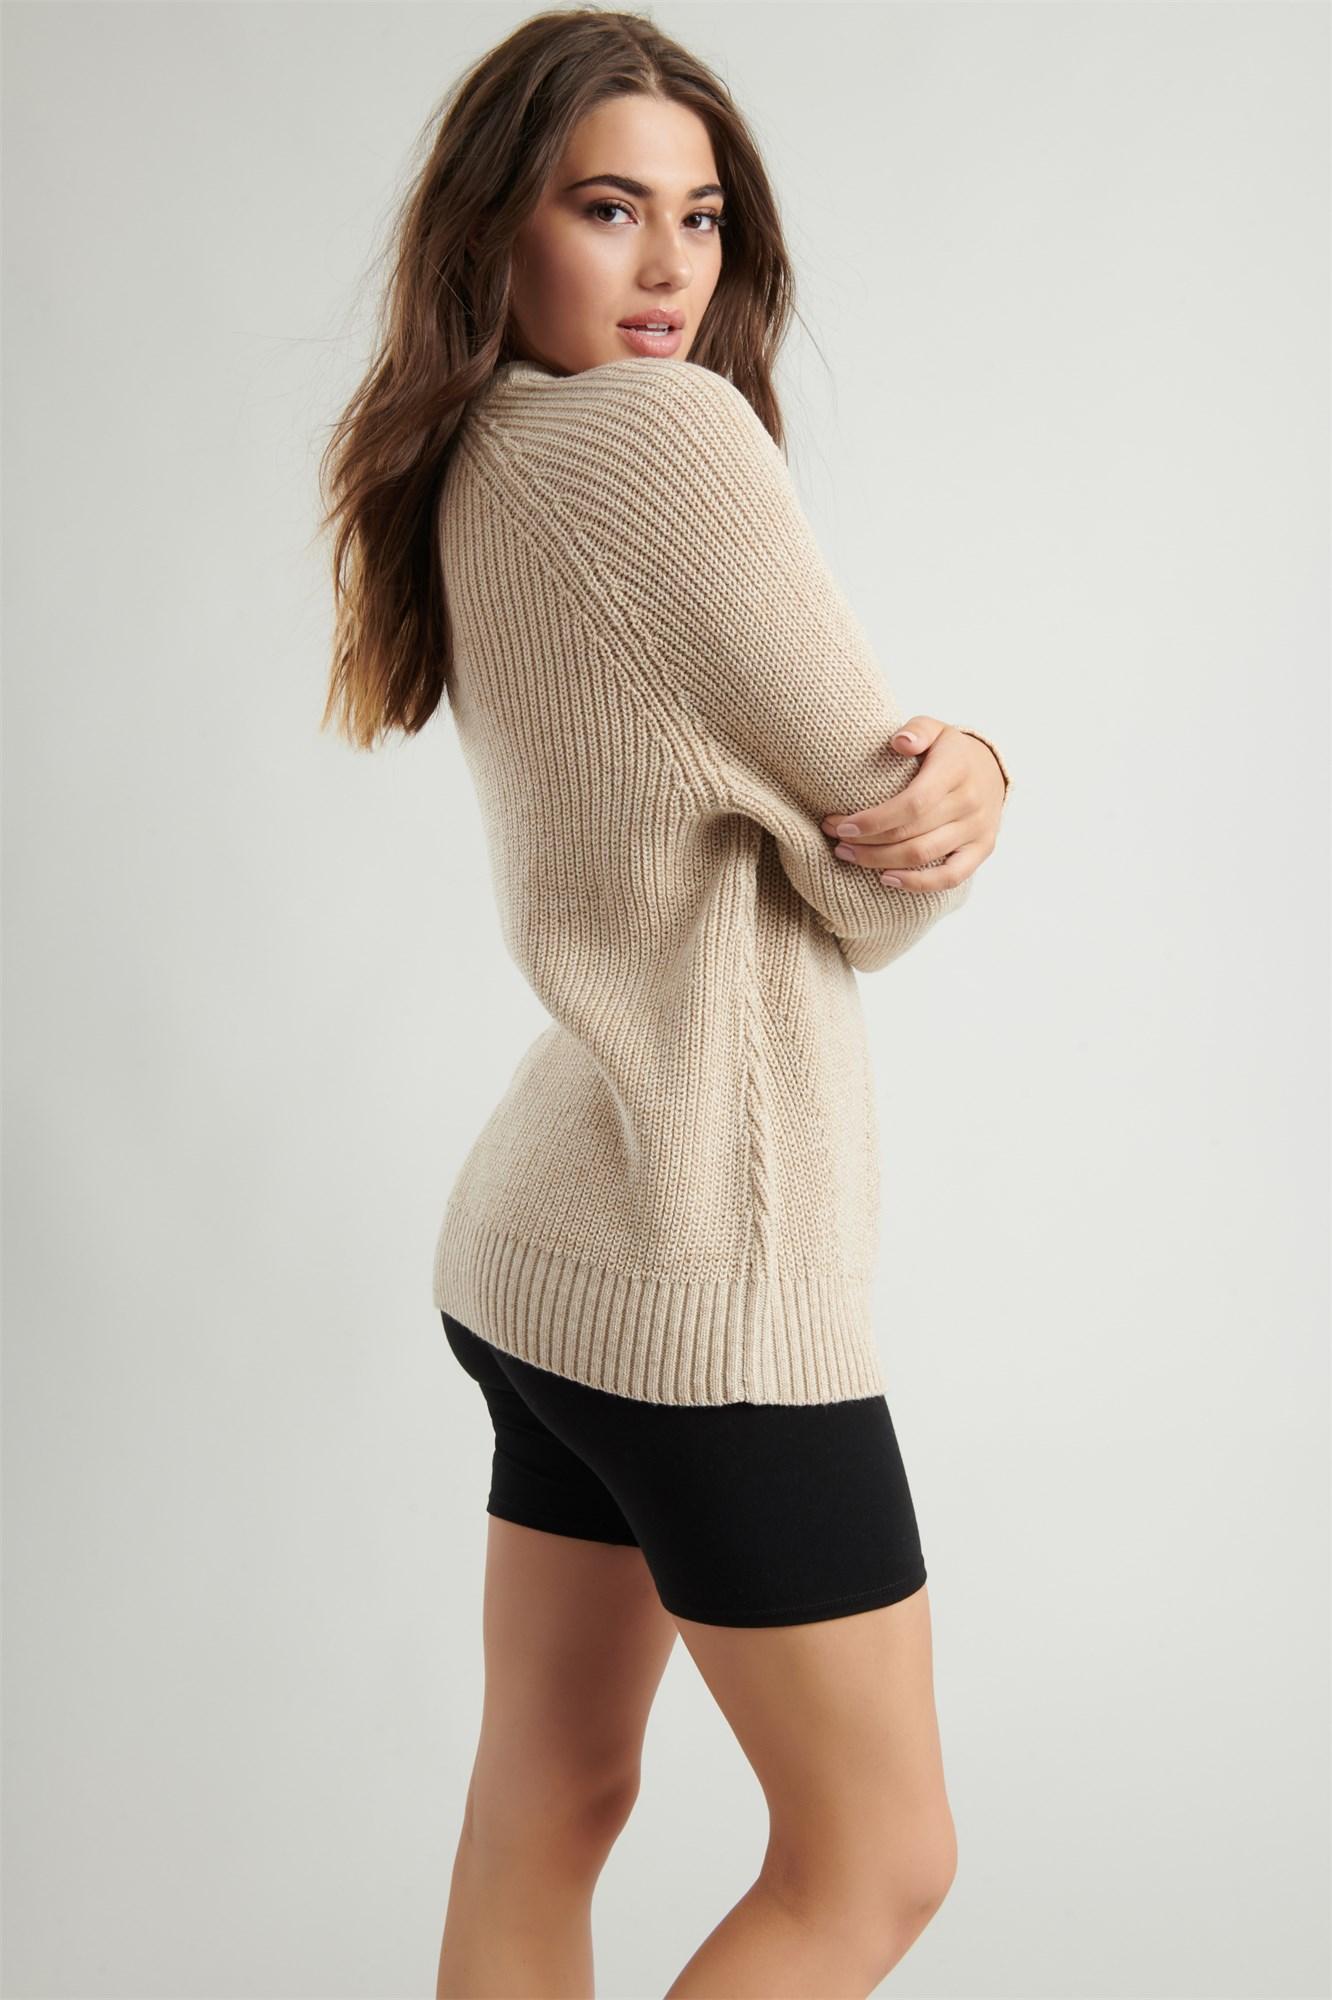 Image 4 of Crew Neck Tunic Sweater